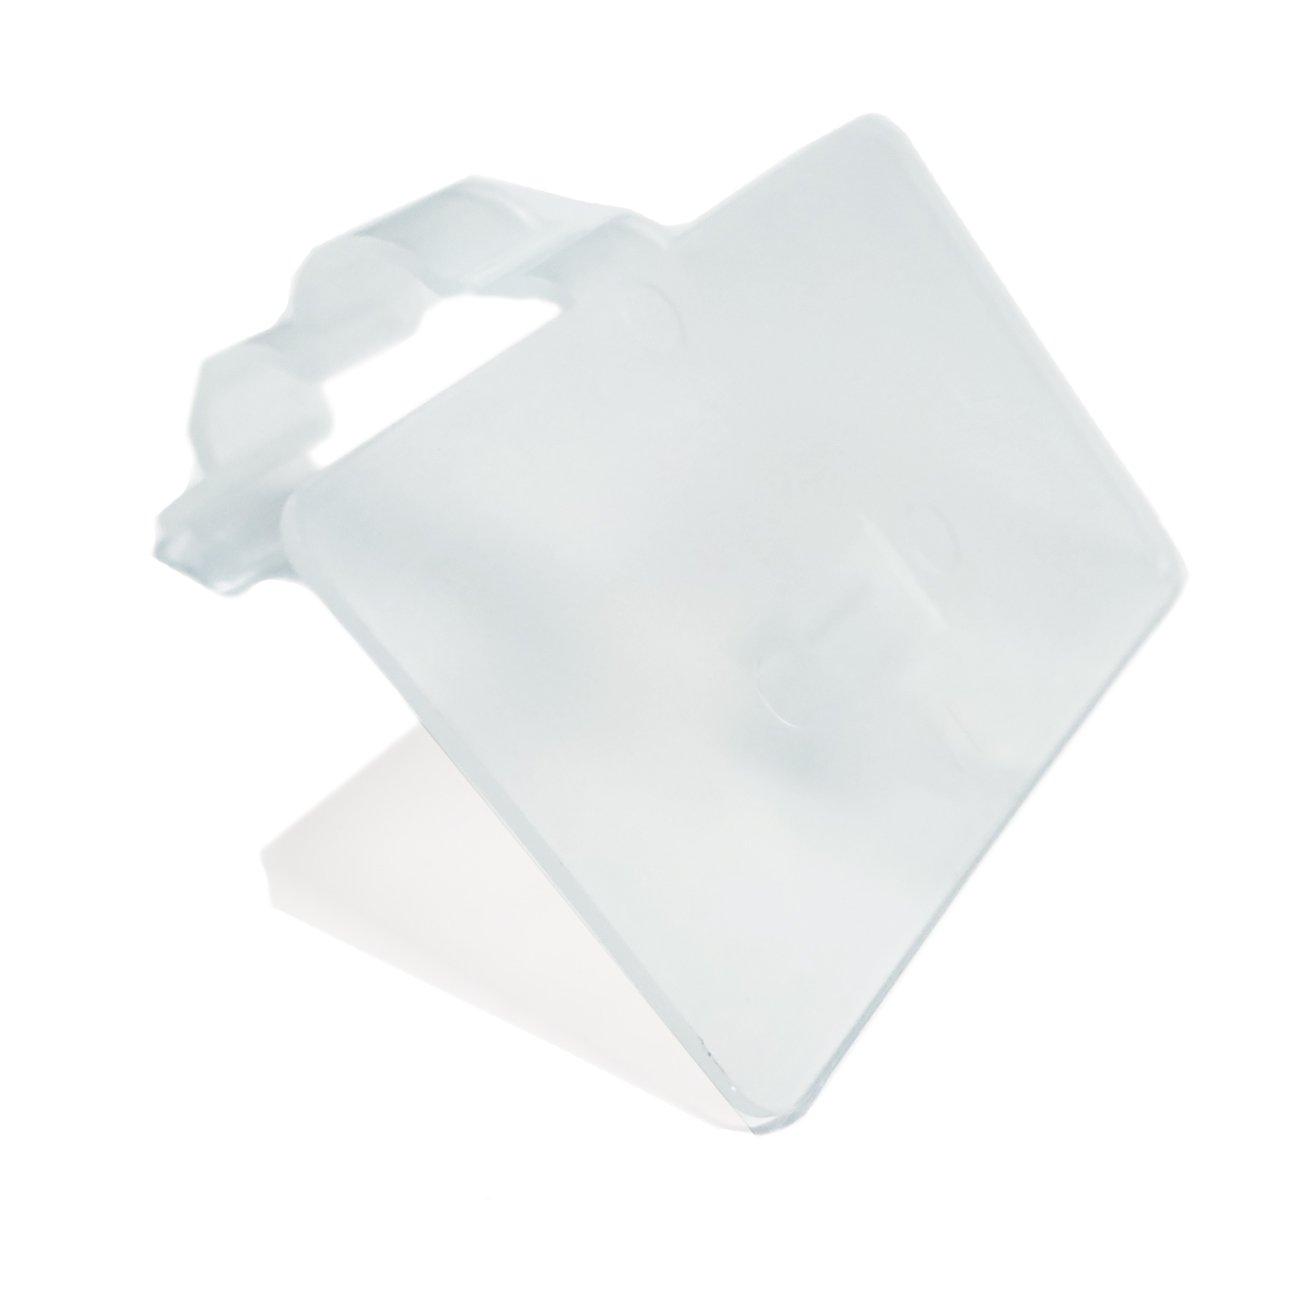 2.25'' L x 1.25'' H Plastic Cooler/Refrigerator UPC Label Holder Clip Organizer for Double Wire Fridge Shelf - 50 Pack